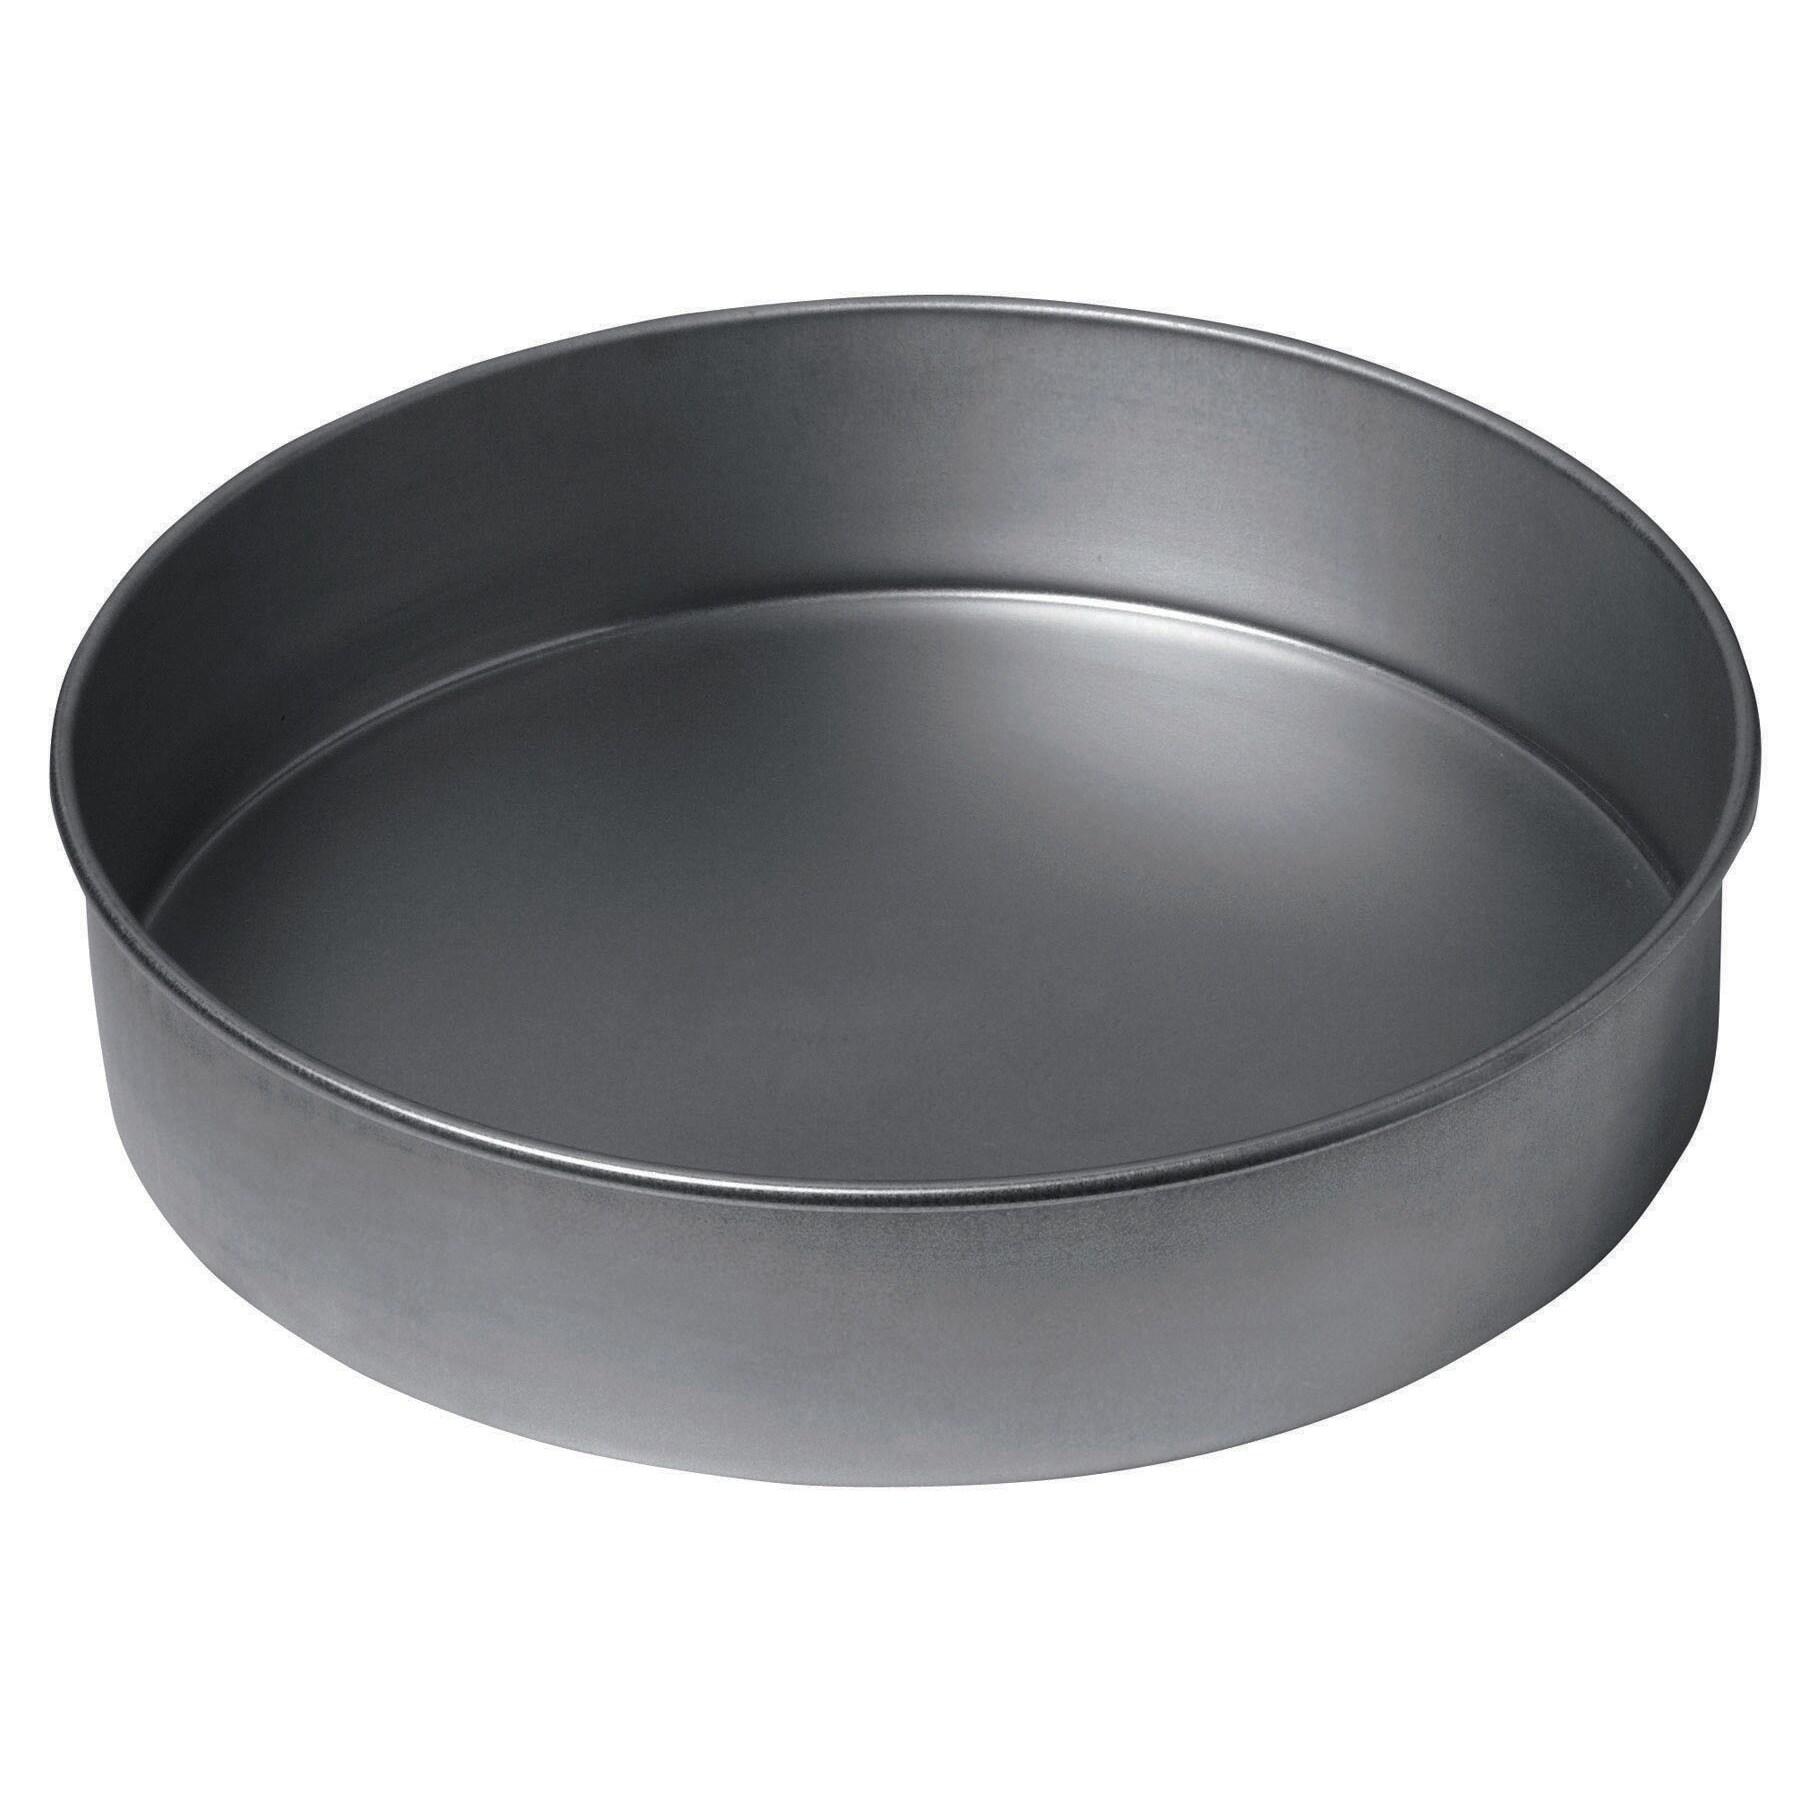 "Chicago Metallic Grey) 16629 9"" Chicago Metallic Round Ca..."